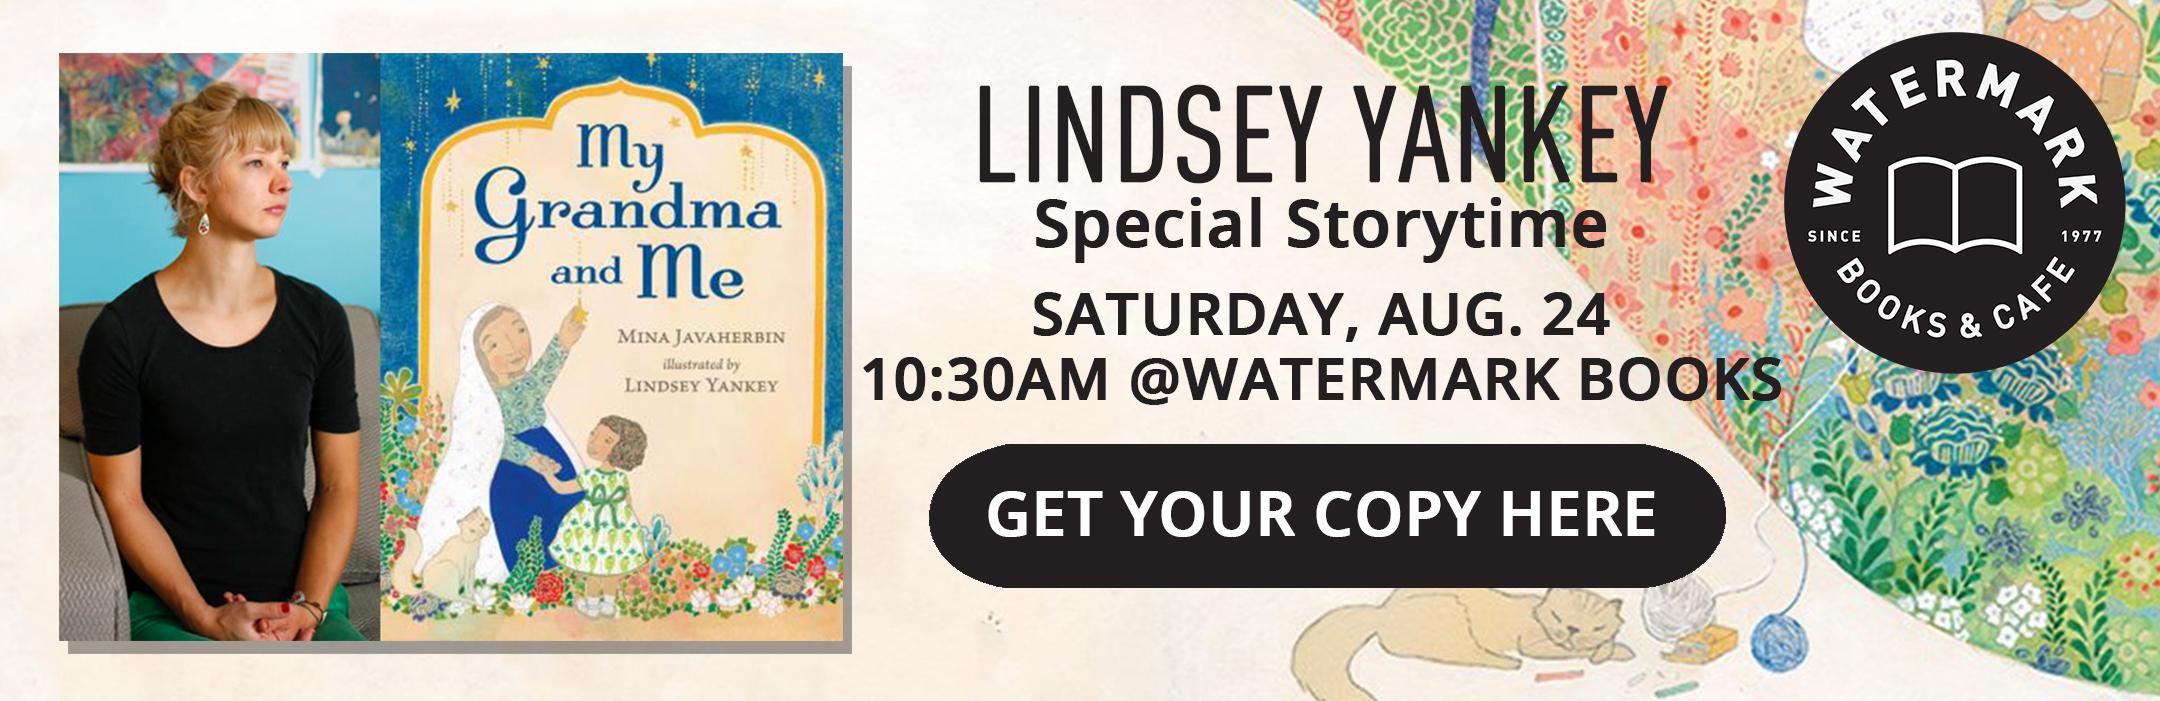 Special Storytime with Kansas Illustrator Lindsey Yankey at Watermark Books